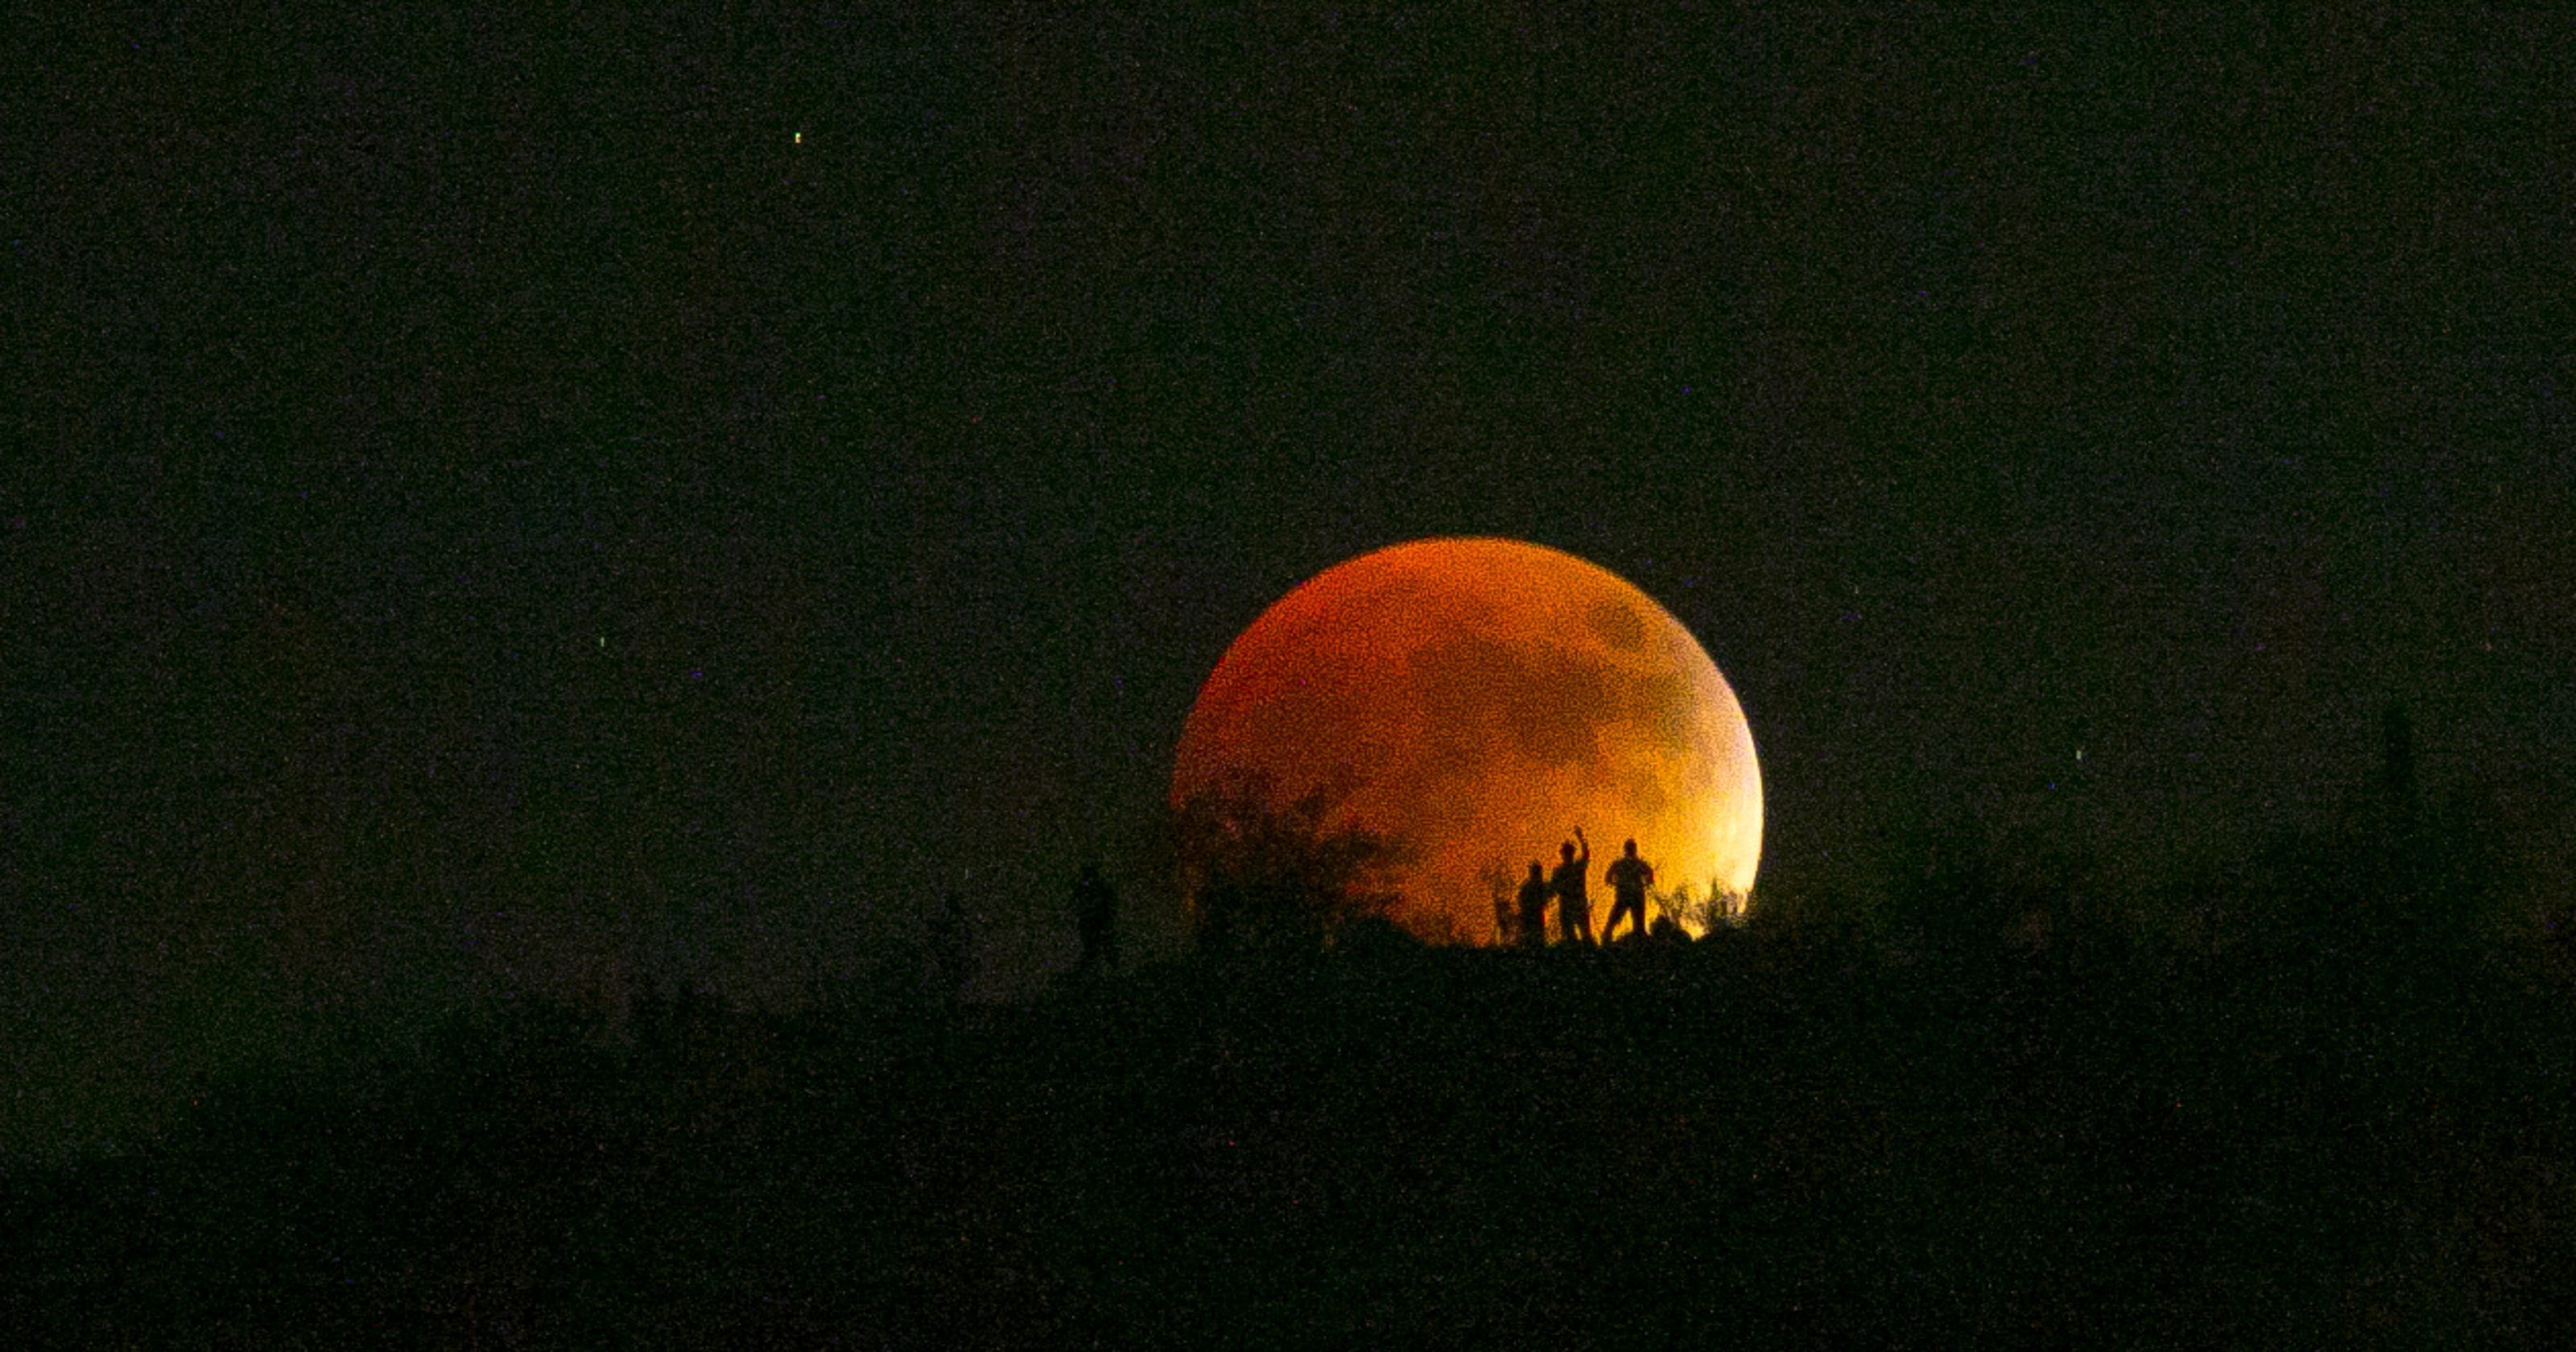 blood moon 2019 arizona - photo #8